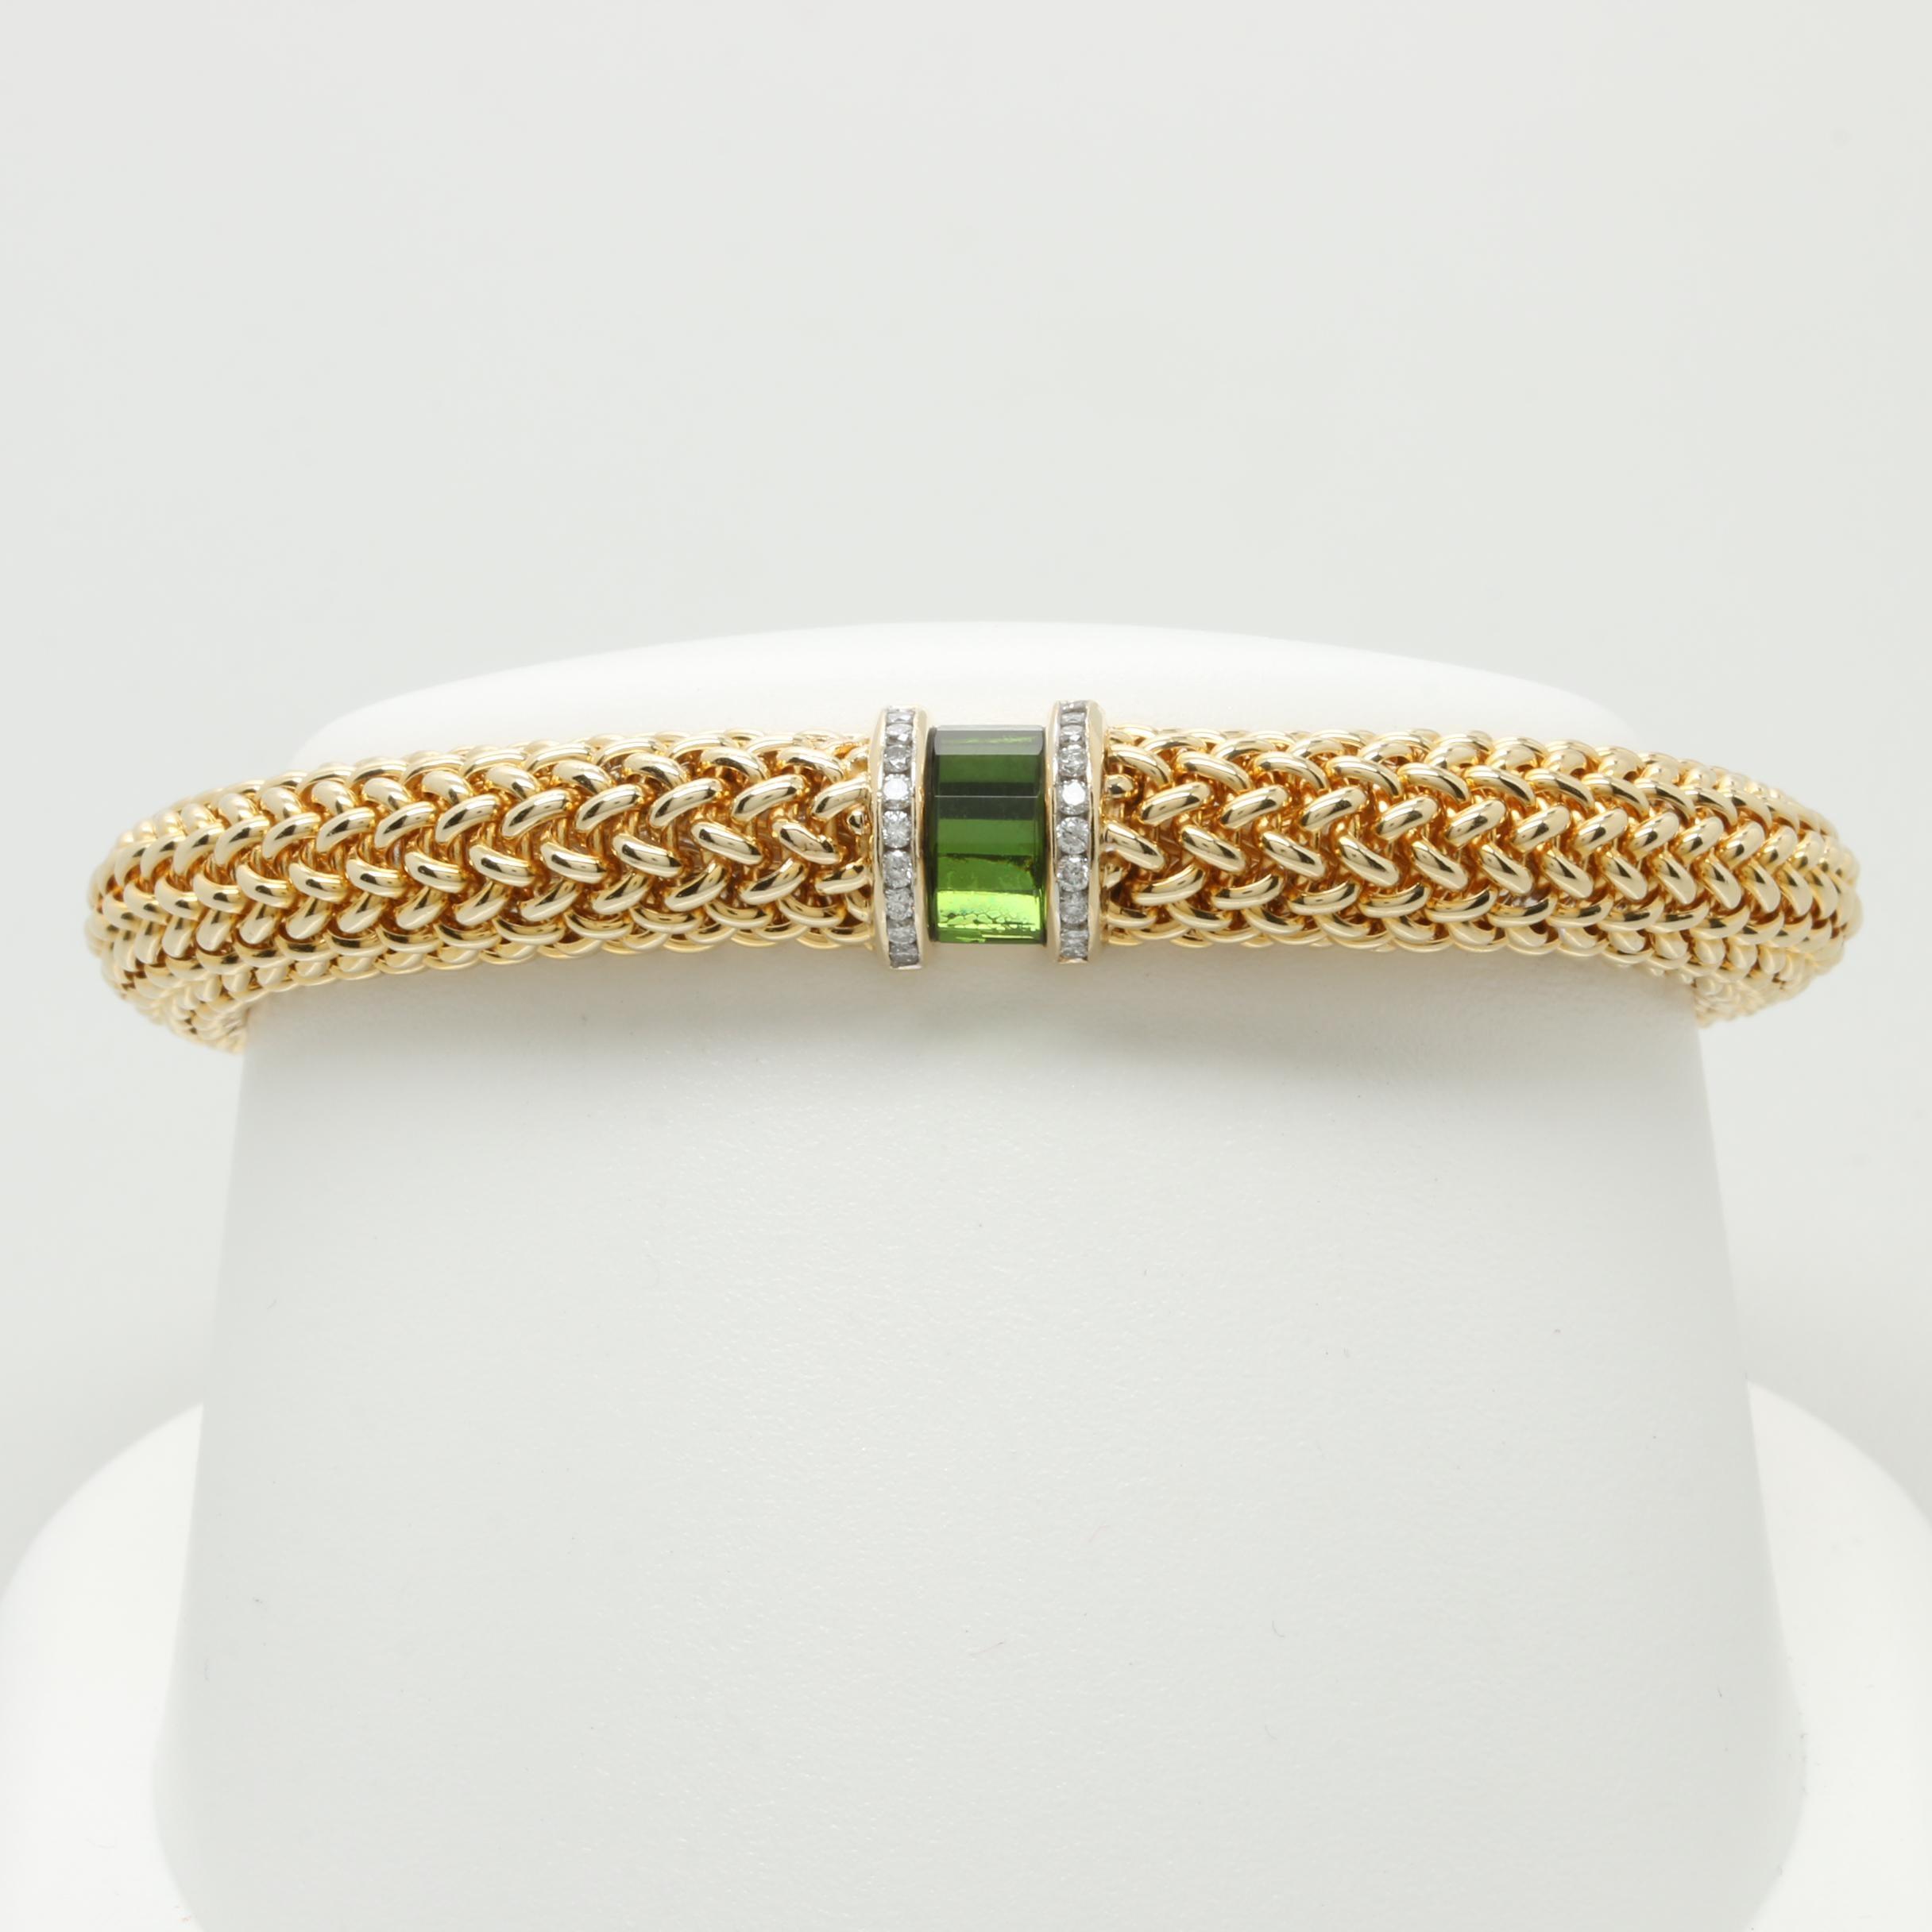 Scott Keating 14K Yellow Gold Tourmaline and Diamond Bracelet